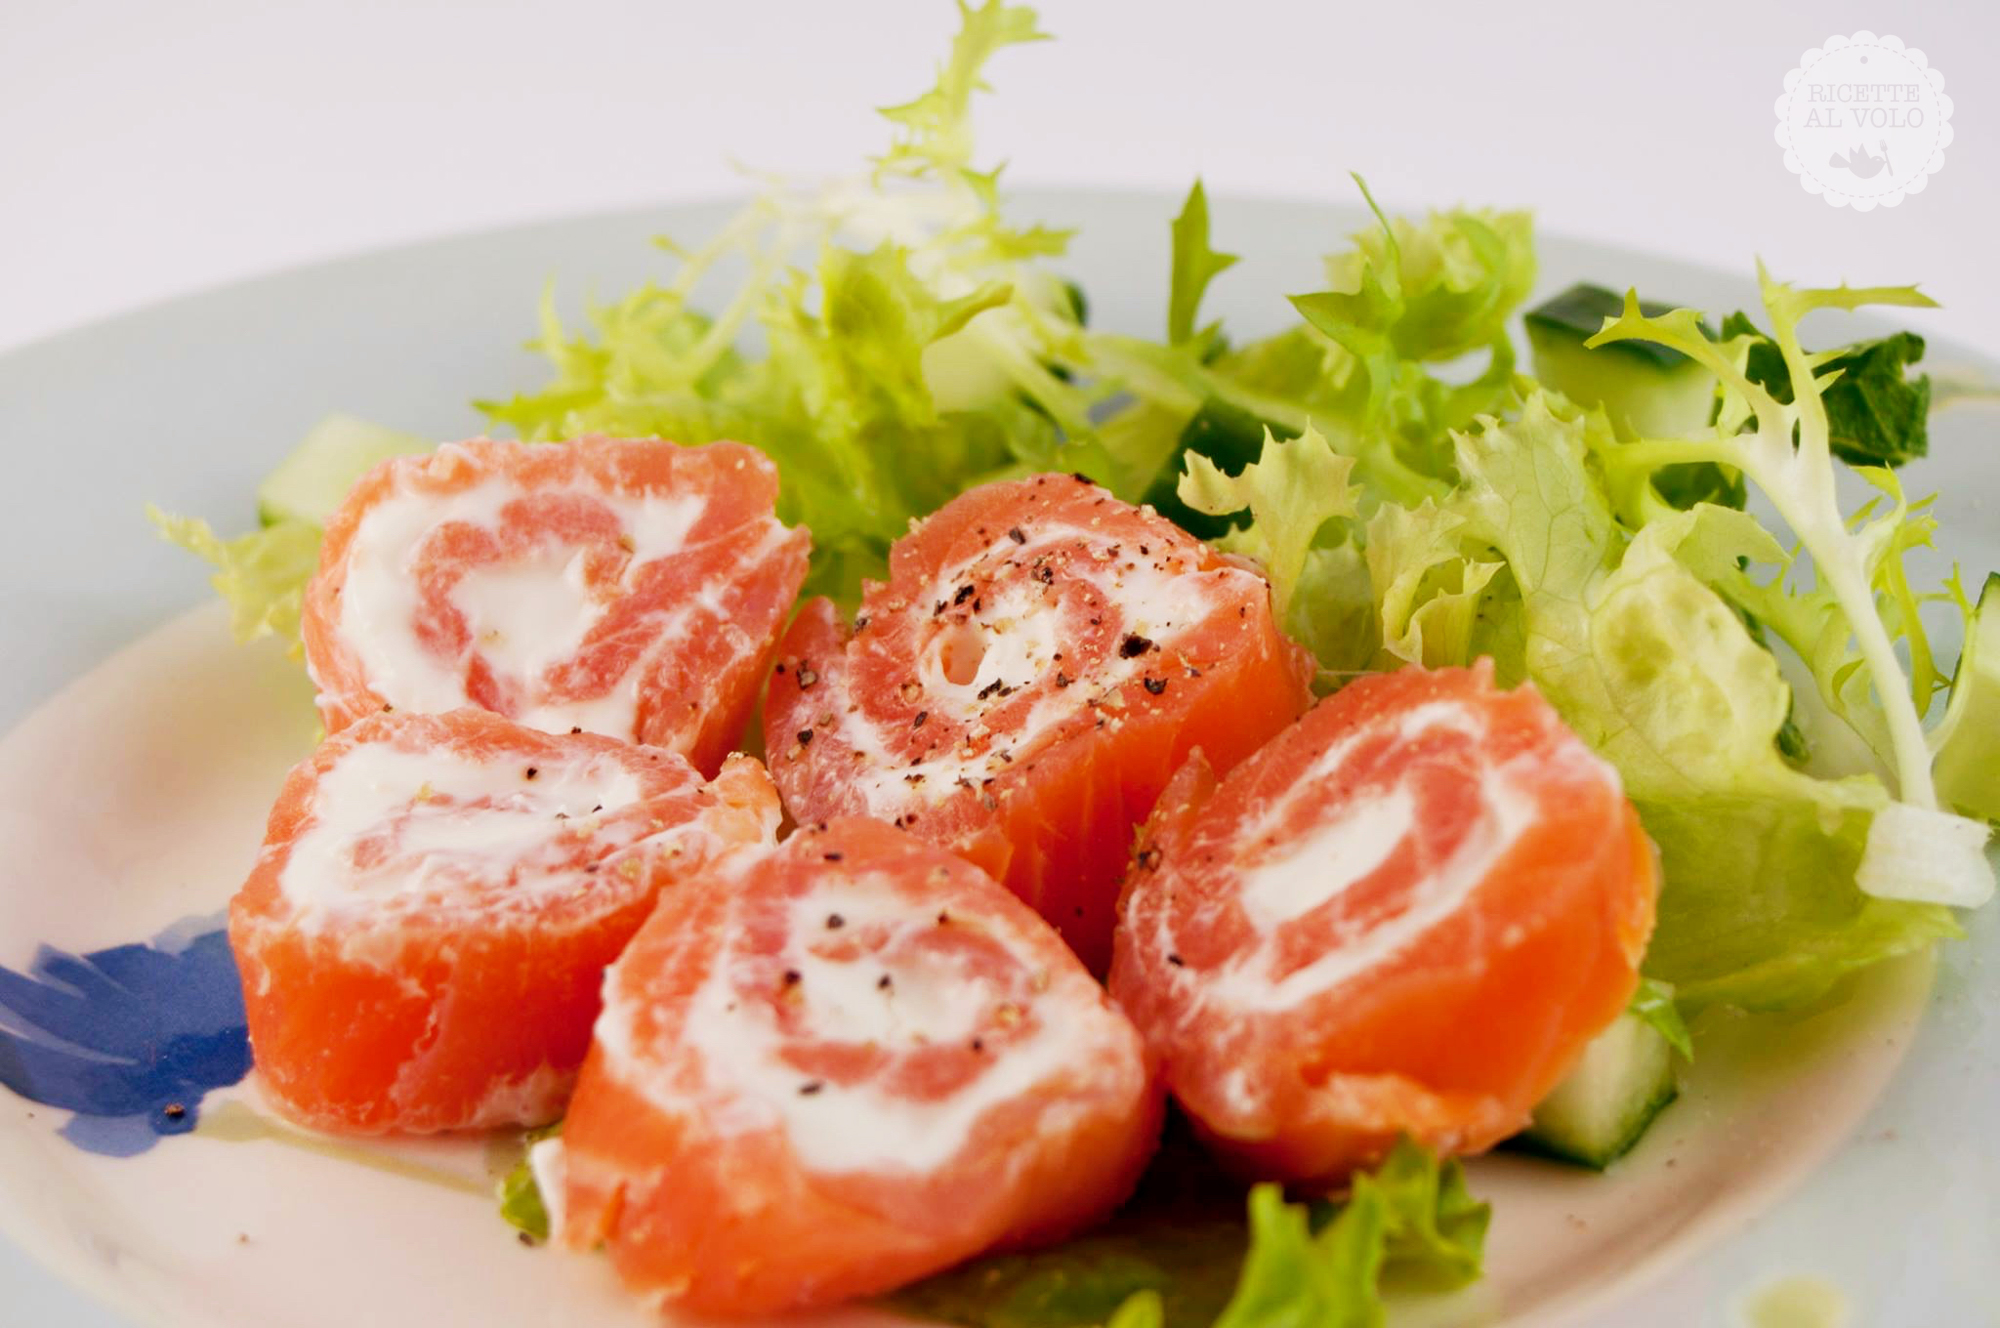 Ricetta Salmone Norvegese Affumicato.Ricetta Girelle Di Salmone Affumicato Ricette Al Volo